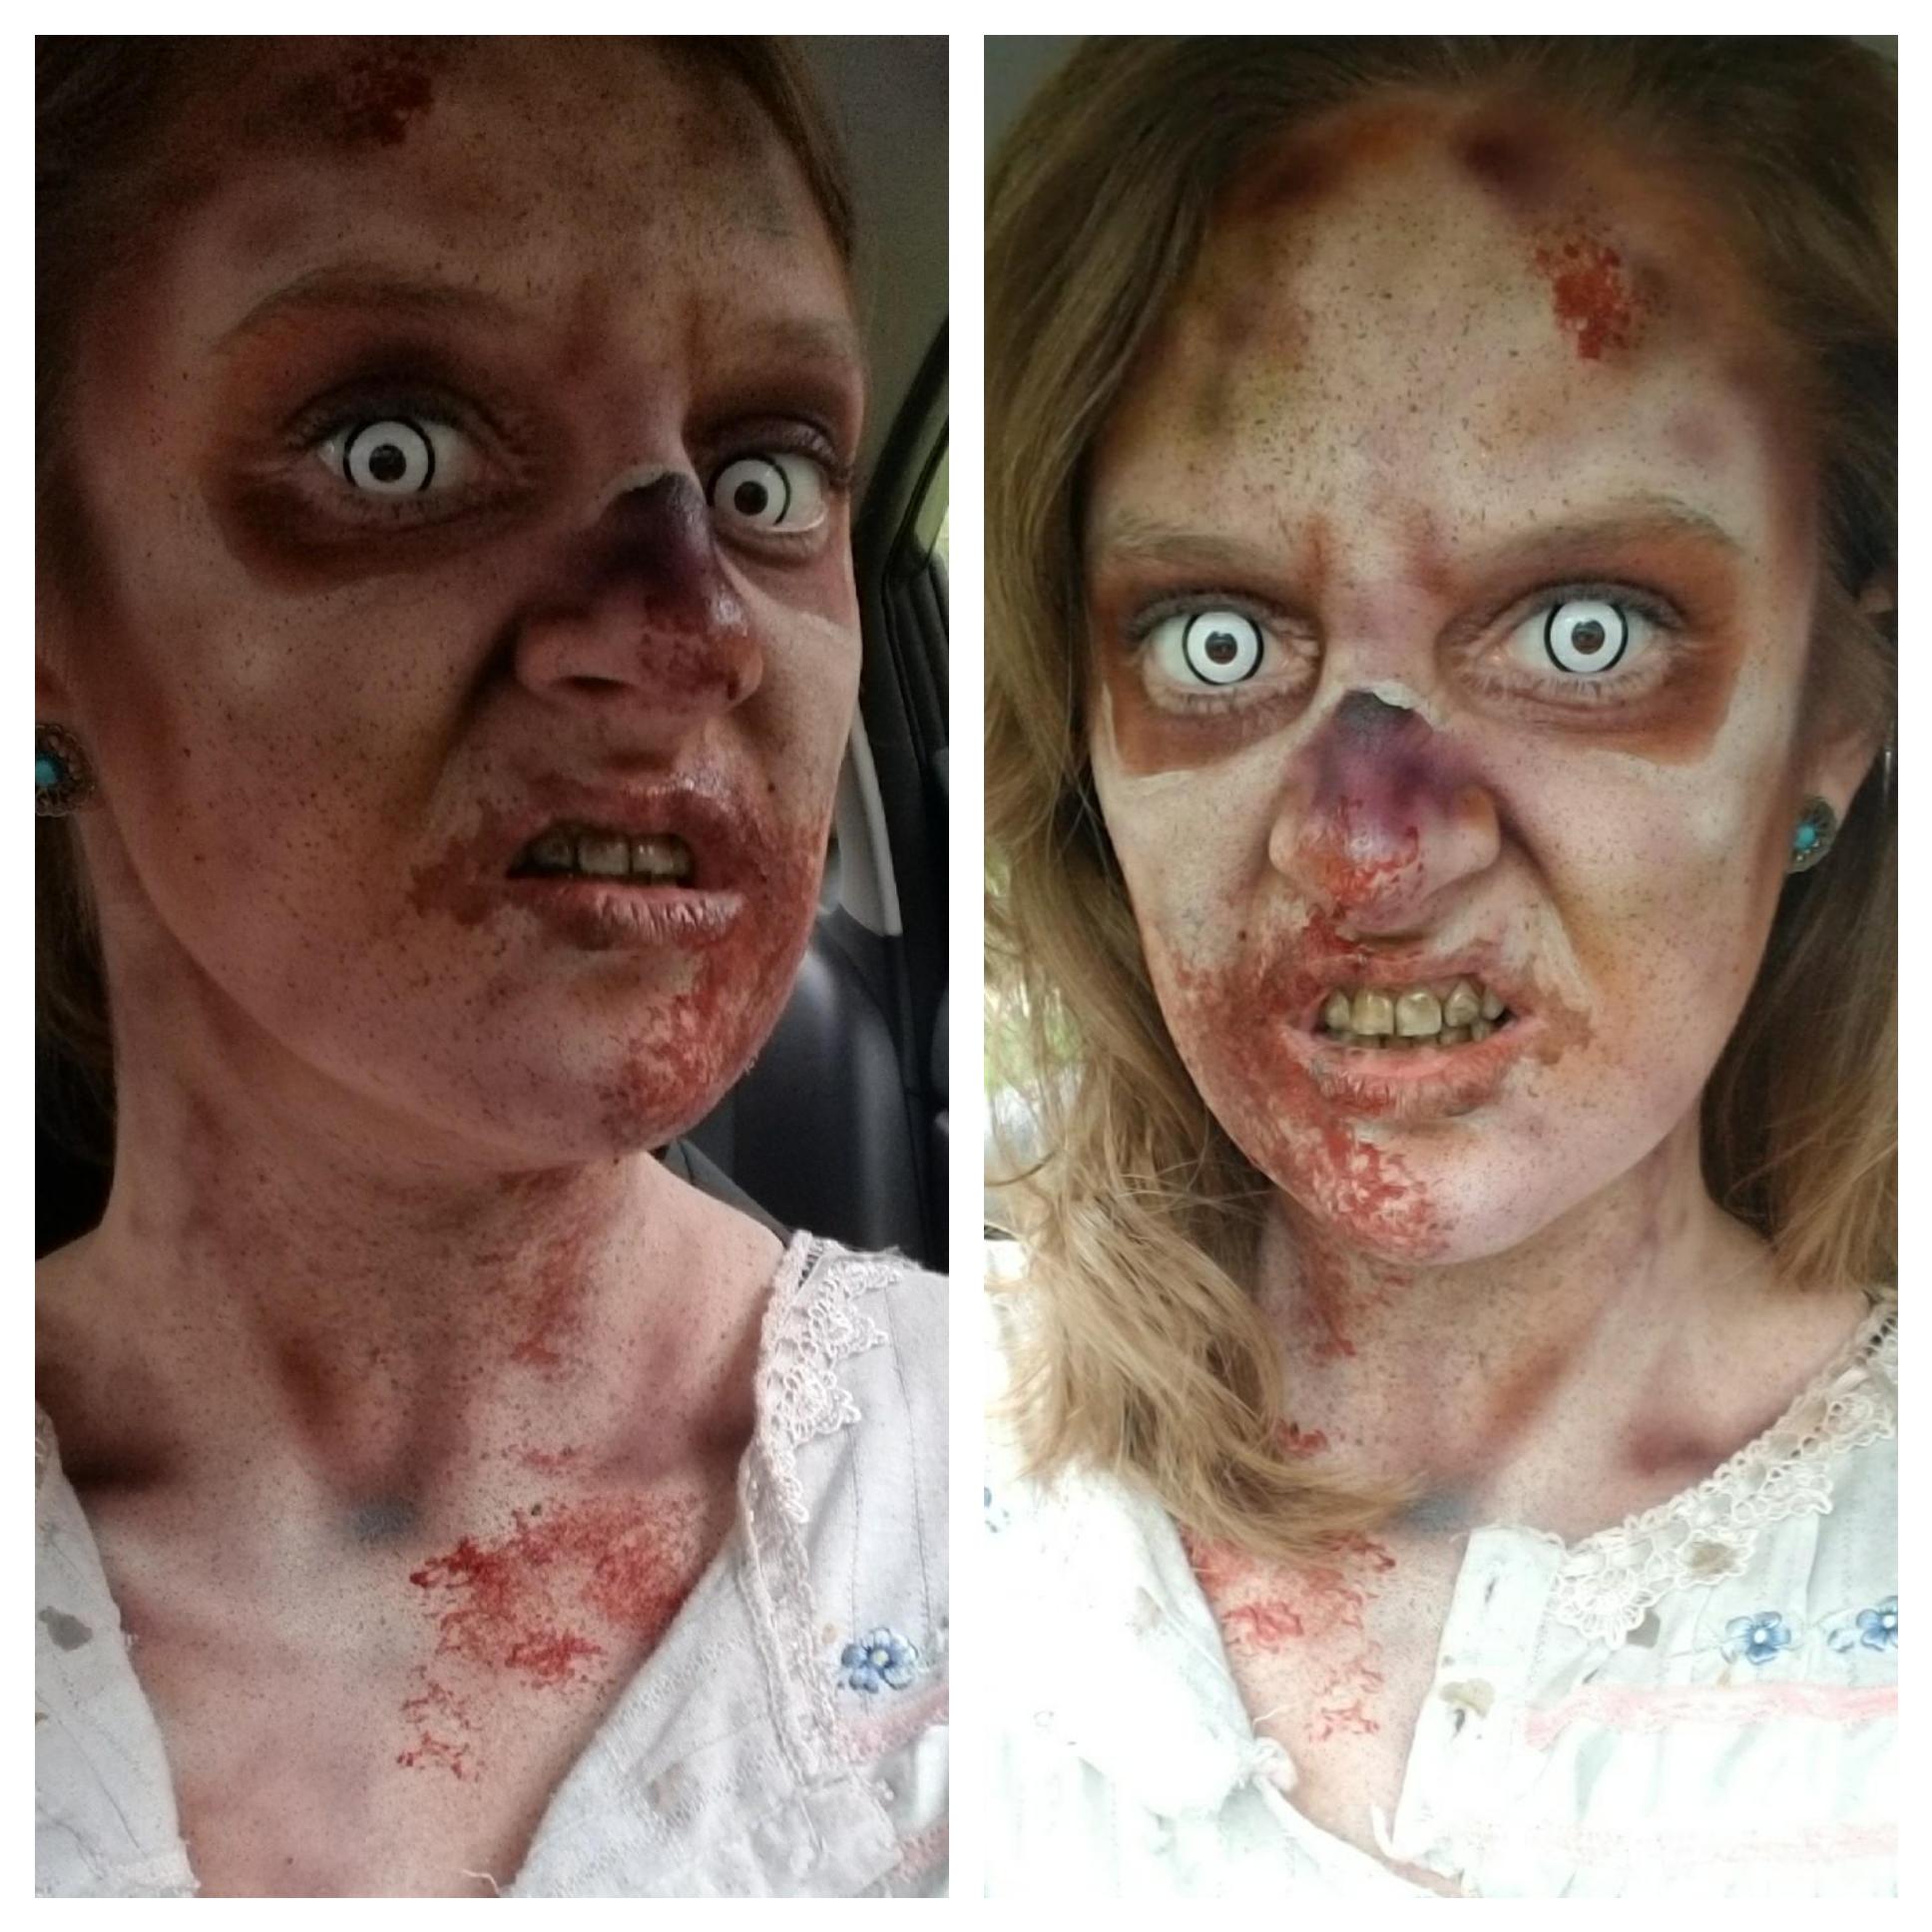 Morgan Dayton in Zombie makeup by me